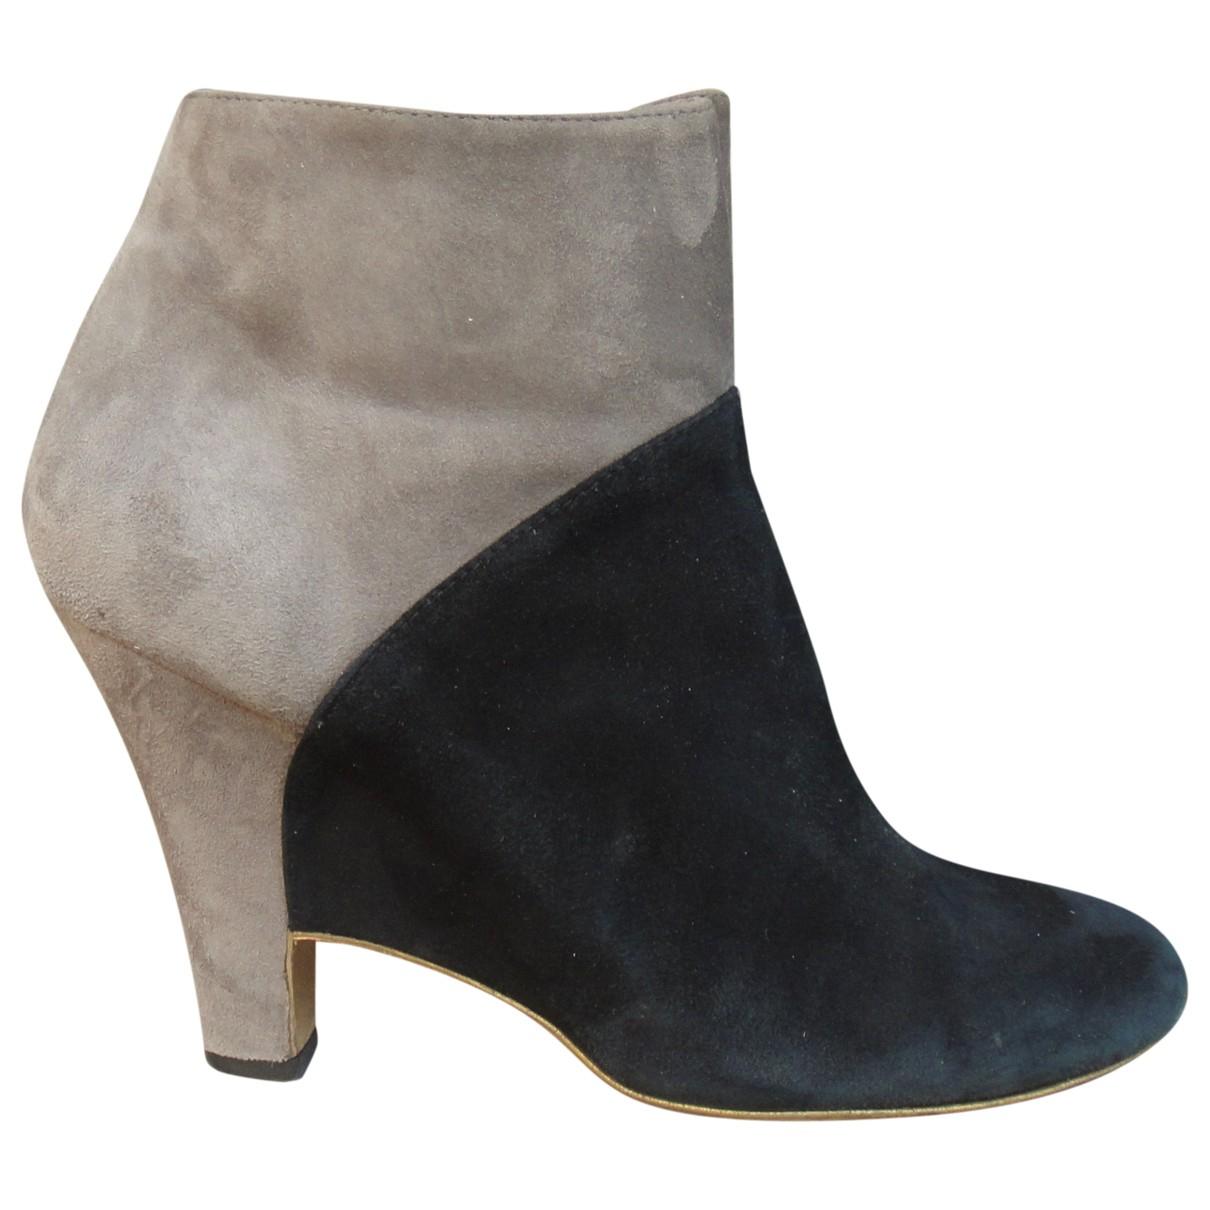 Salvatore Ferragamo \N Black Suede Ankle boots for Women 9 US